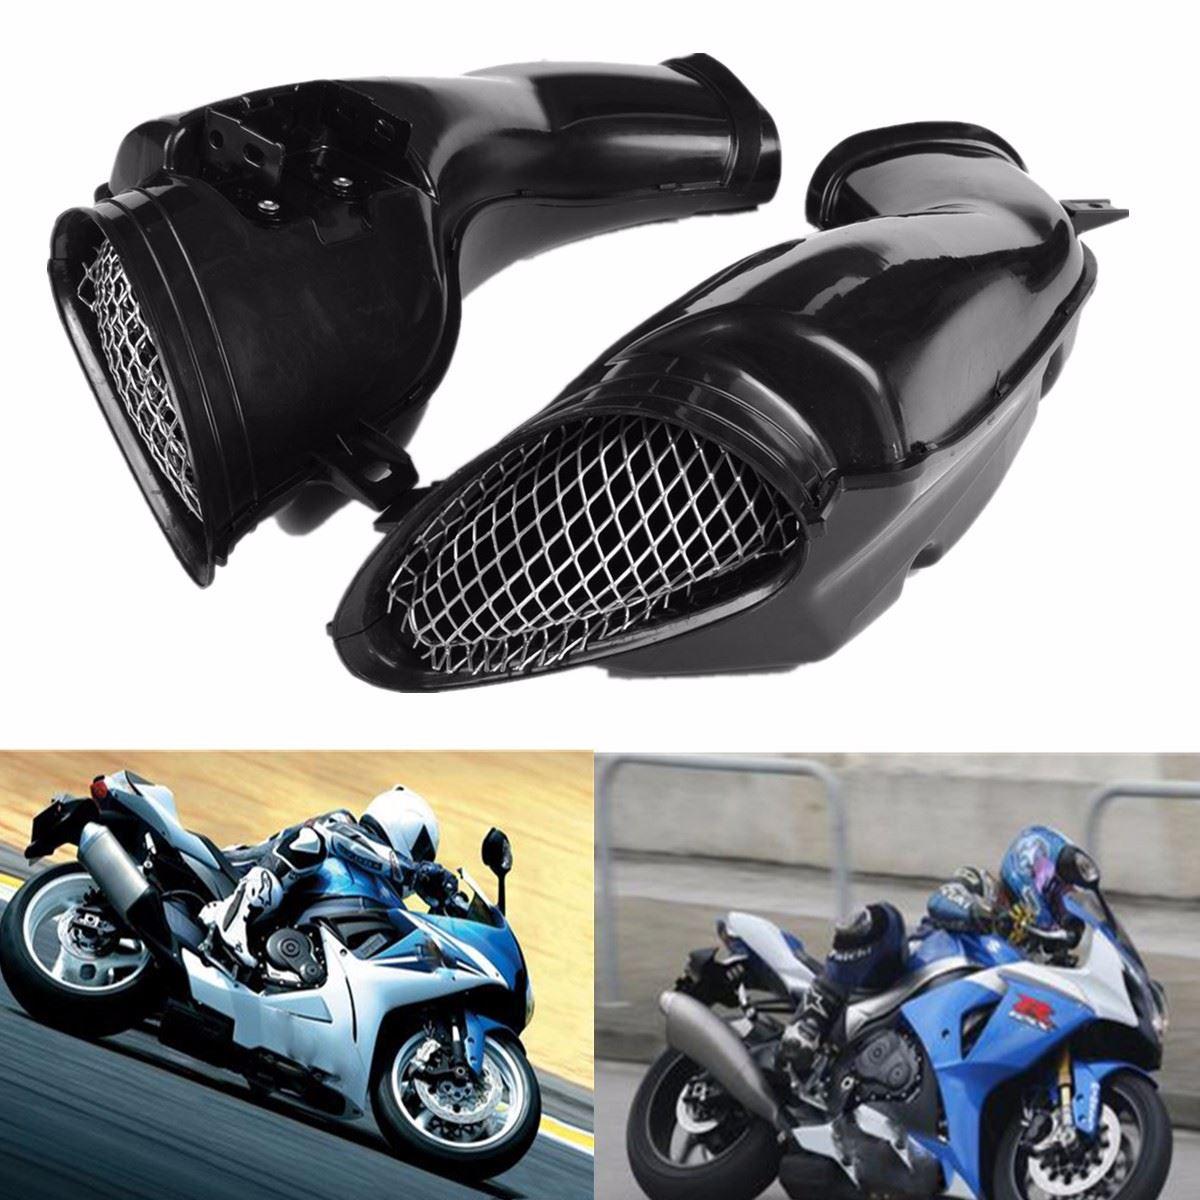 1 Pair Black Motorcycle Air Intake Pipe Vent Tube Fit For SUZUKI /GSXR 600/750/1000 2000-2003 new motorcycle ram air intake tube duct for suzuki gsxr600 gsxr750 2006 2007 k6 abs plastic black